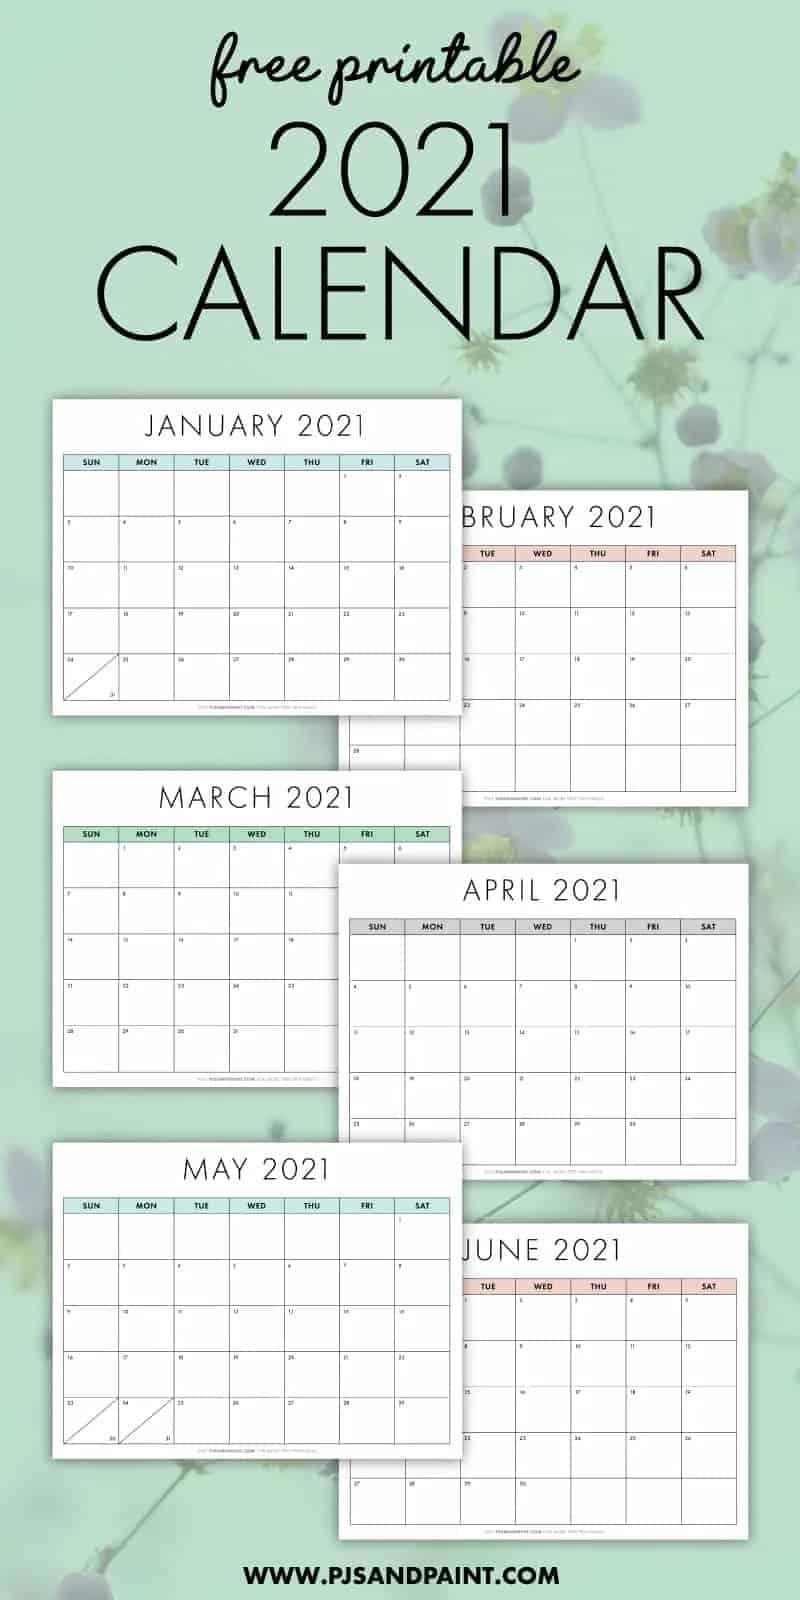 13 Cute Free Printable Calendars For 2021 You'Ll Love